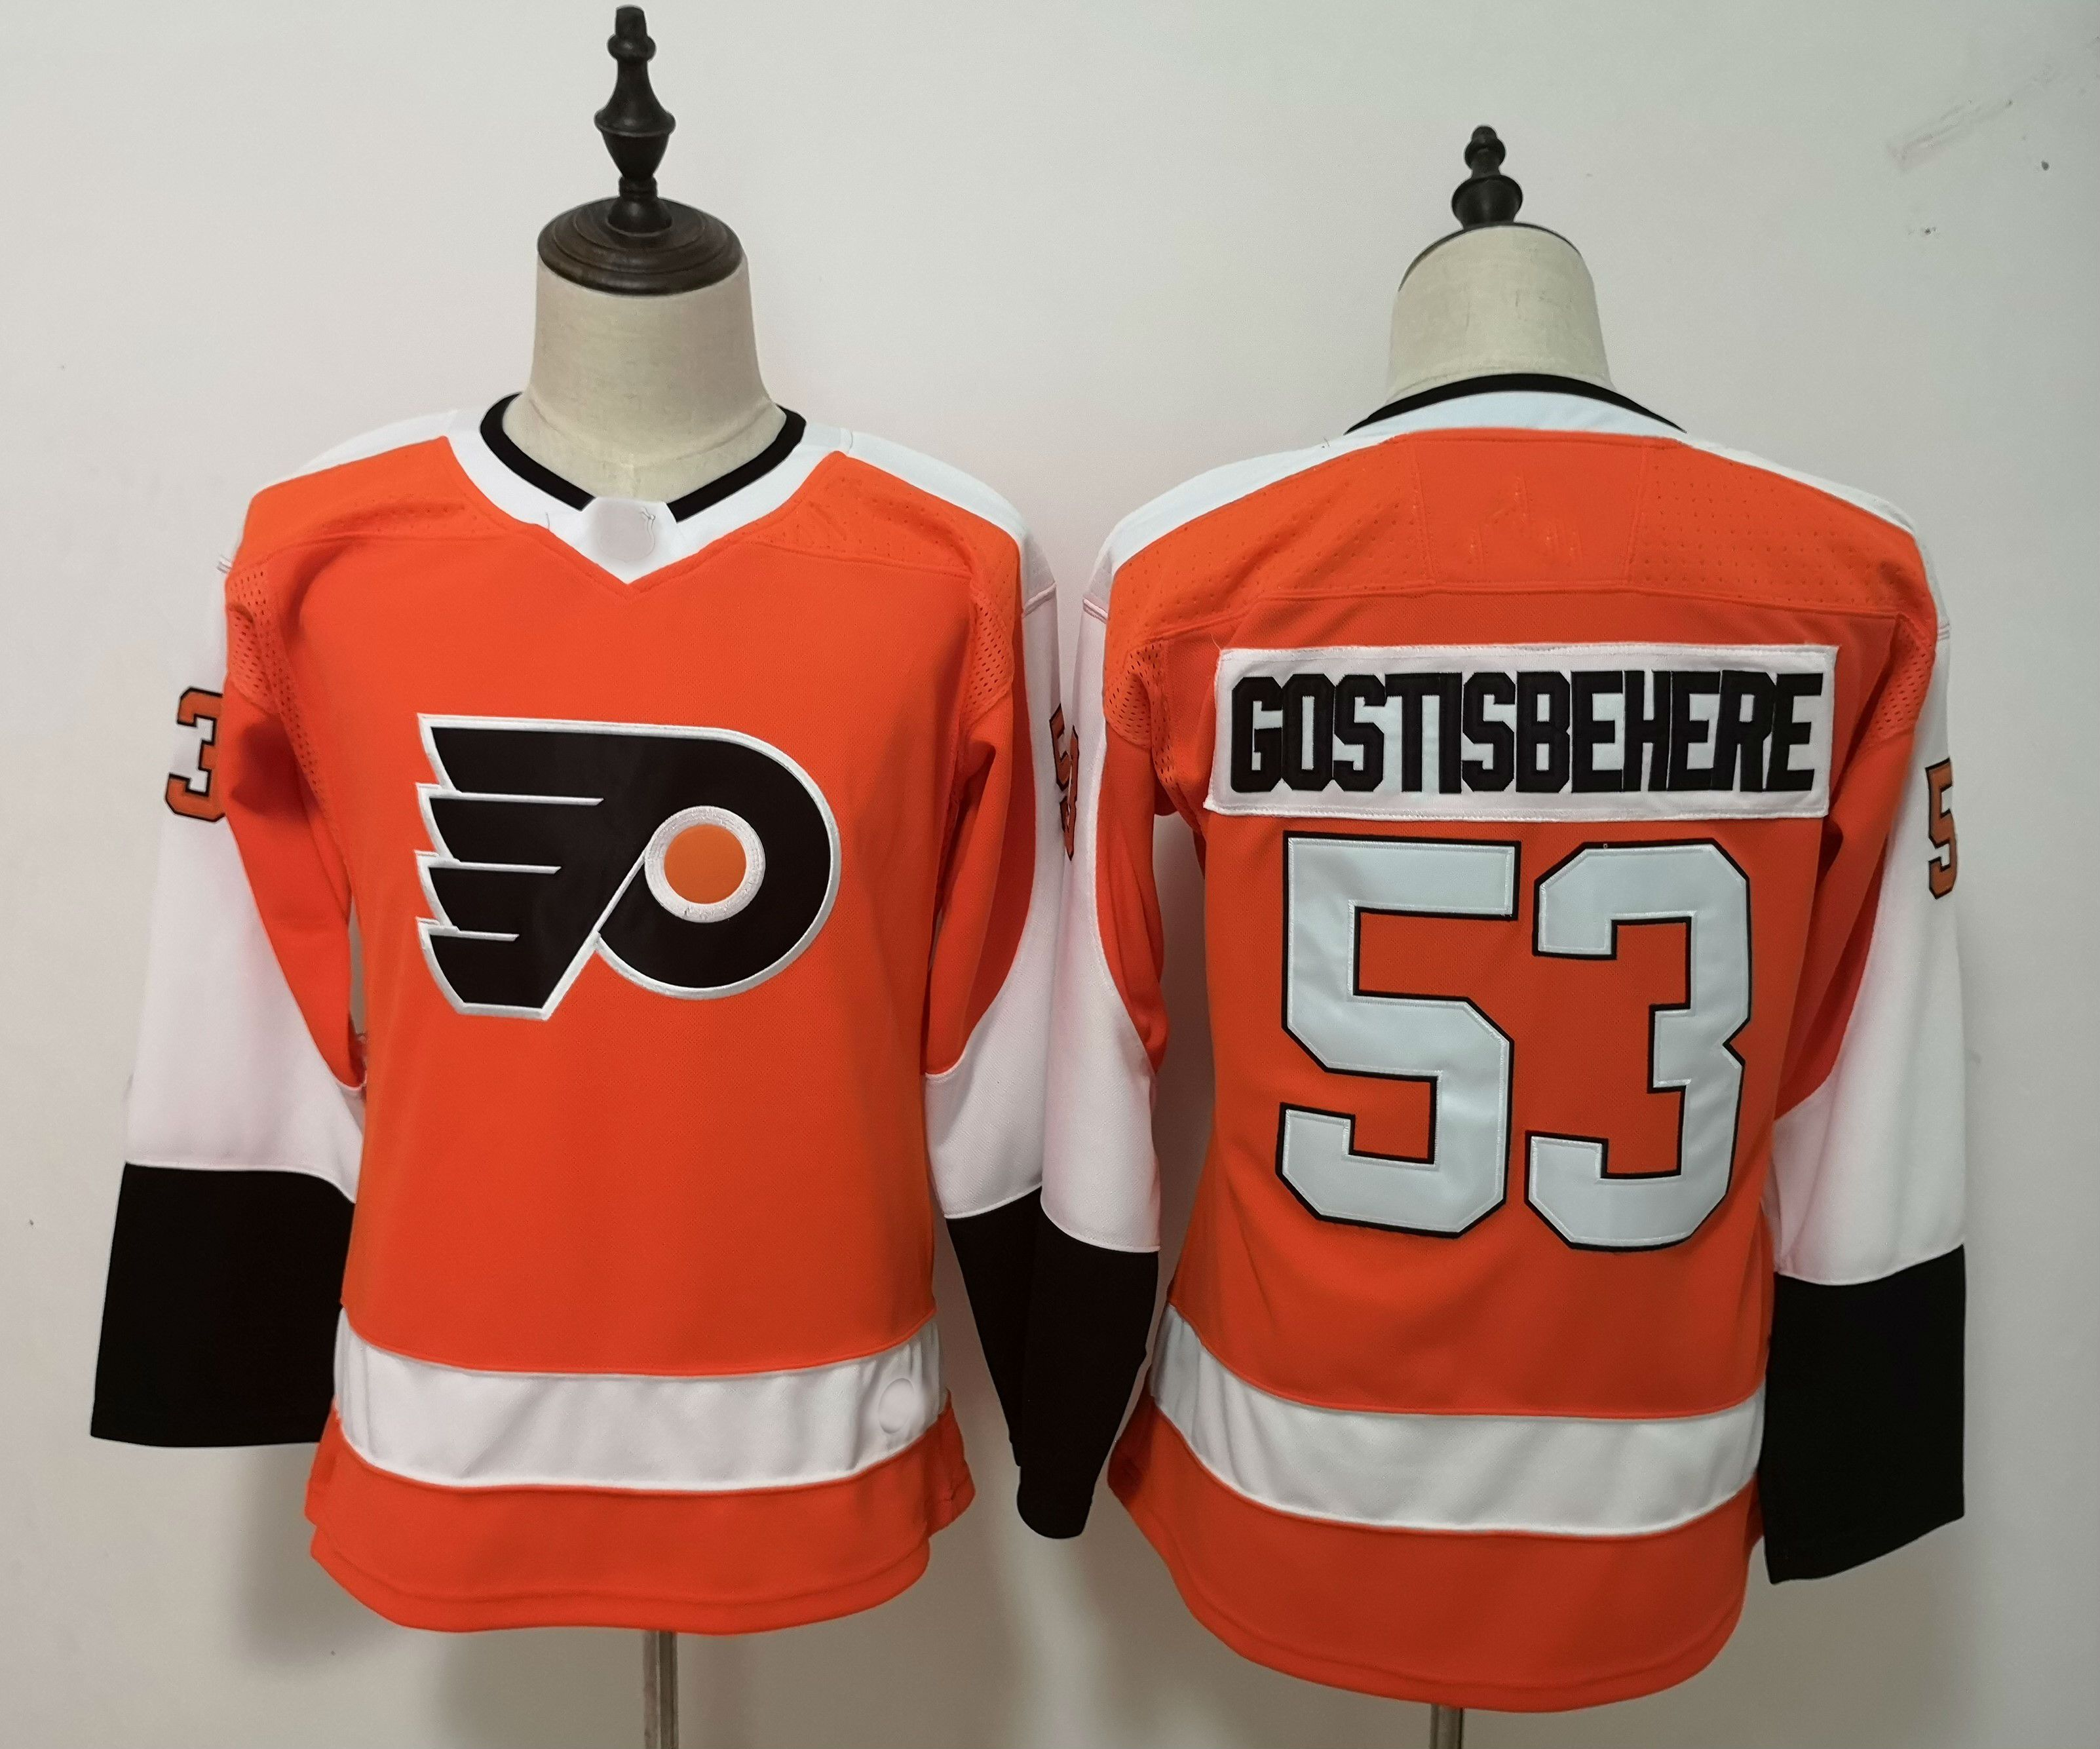 separation shoes bc7ec 91b51 2019 Women NHL #53 Shayne Gostisbehere Philadelphia Flyers Authentic Player  Jersey